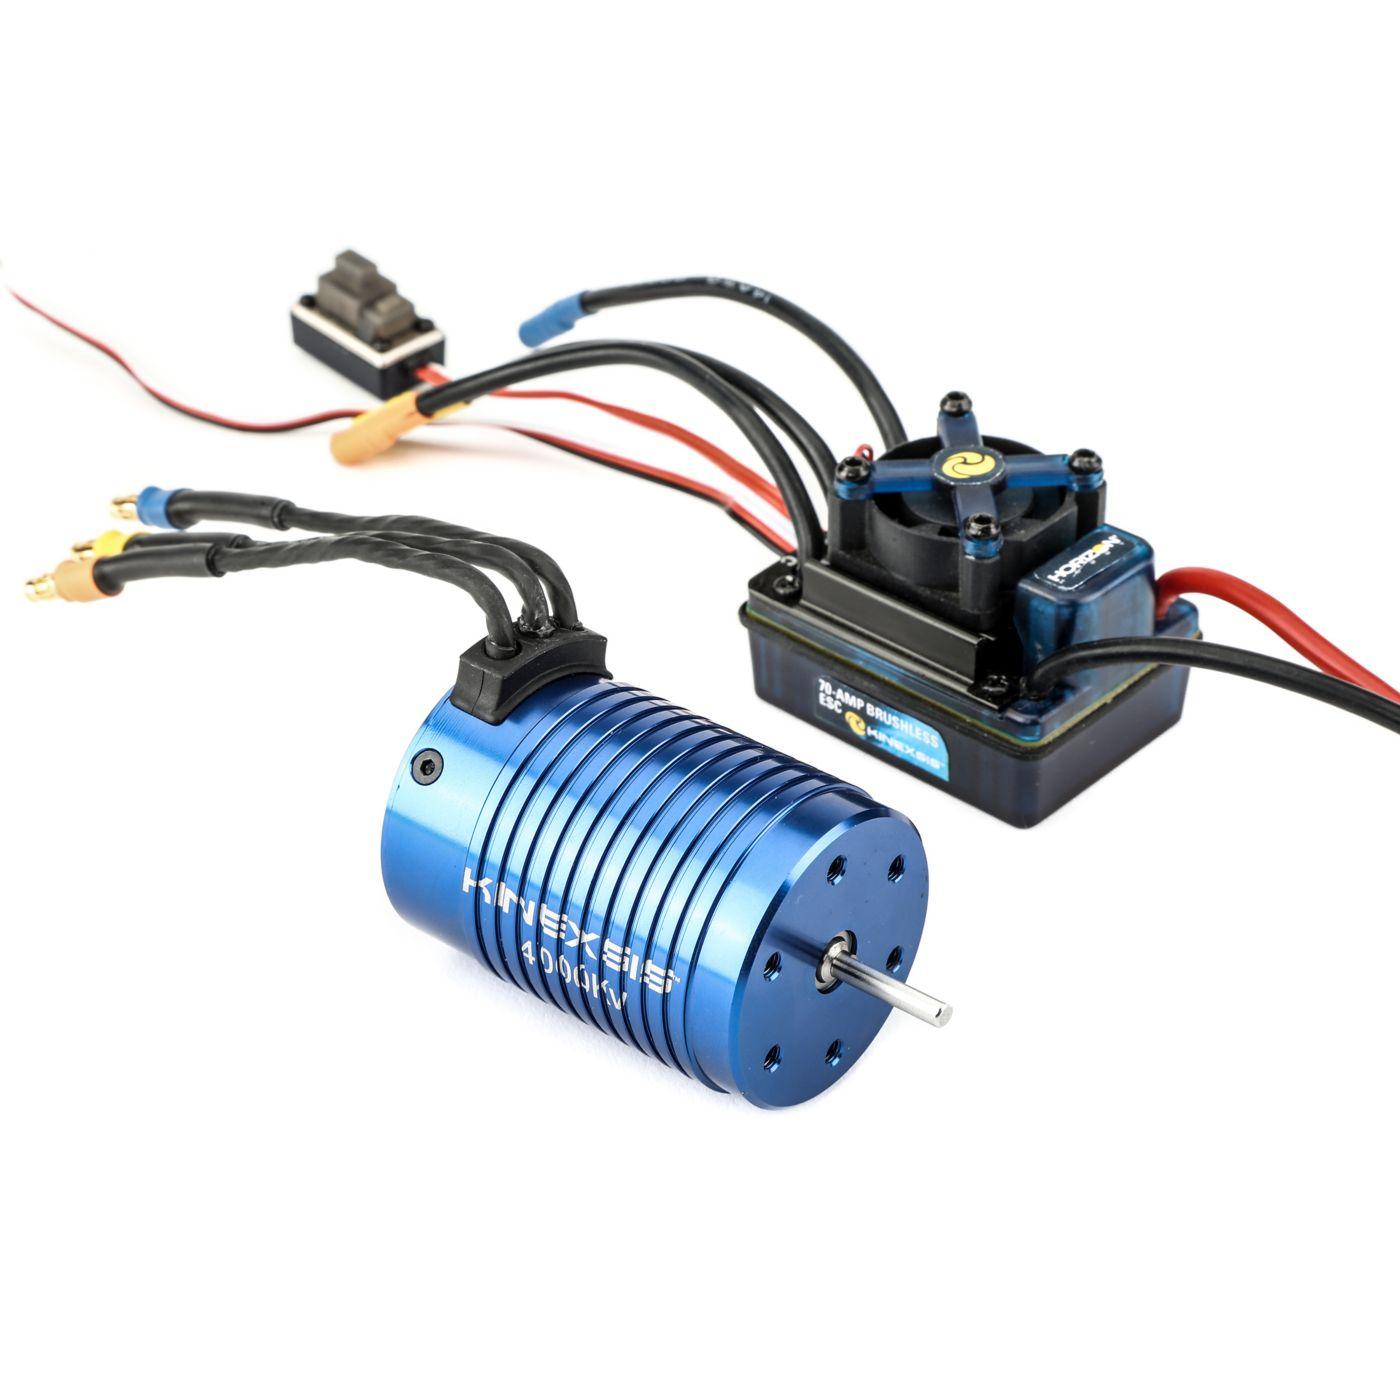 1 10 4 pole 4000kv esc motor combo horizonhobby north american edition electrical wiring harness with eicv escv [ 1400 x 1400 Pixel ]